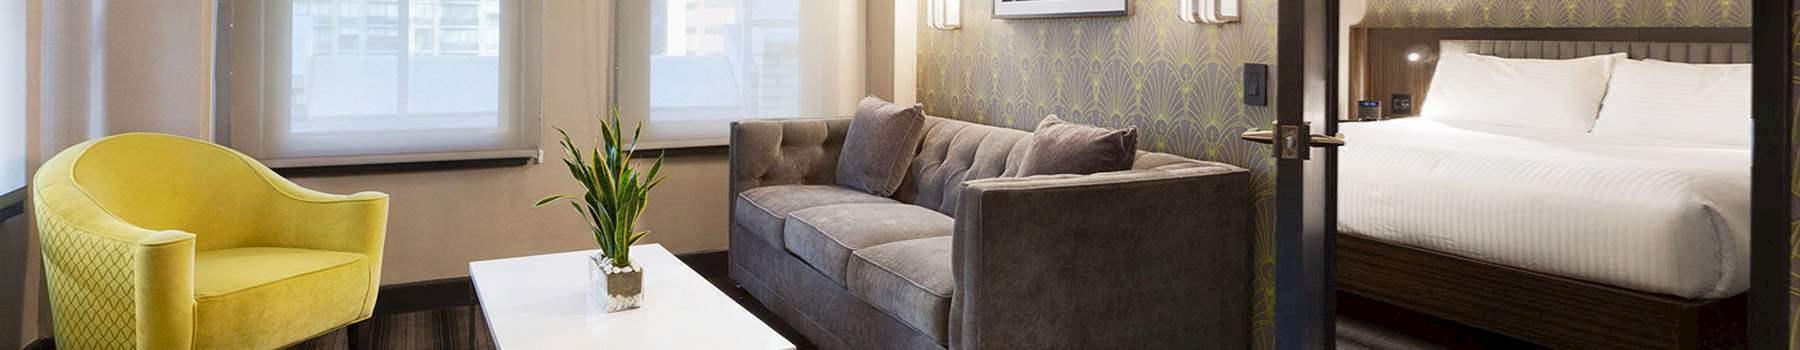 Rooms + Suites of Hotel Edison Newyork